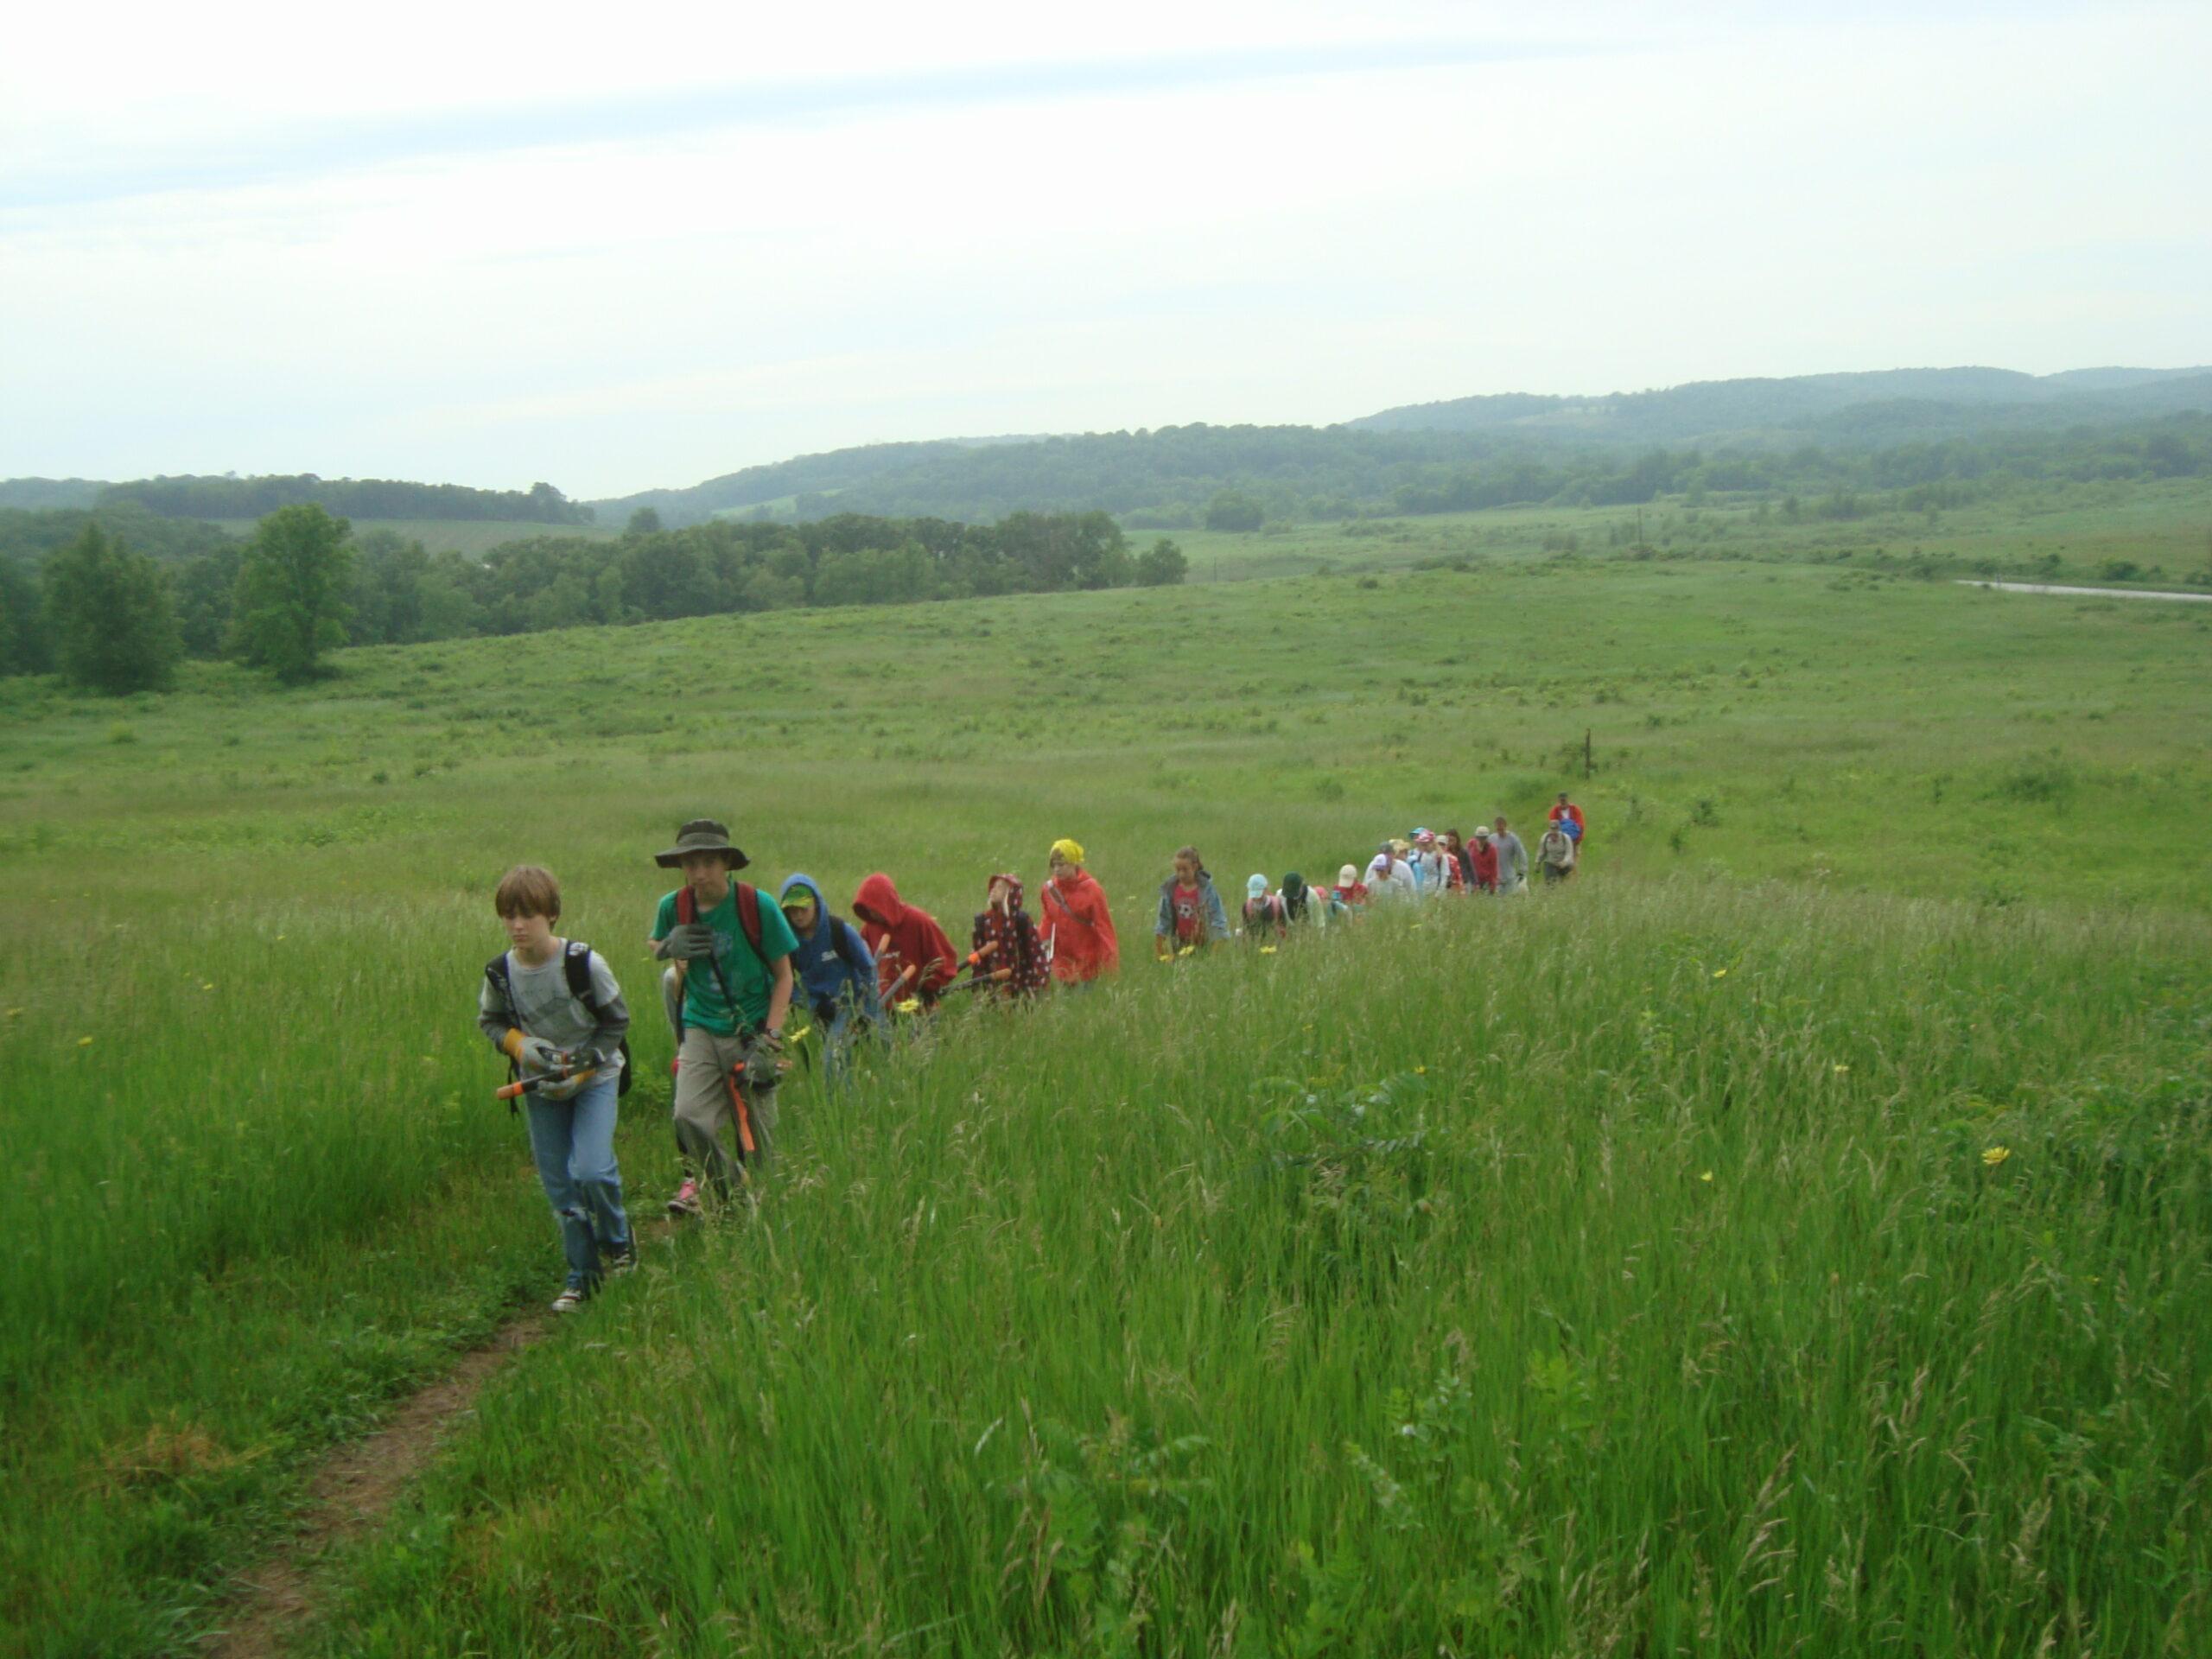 Saunters students on the Lodi Marsh Segment